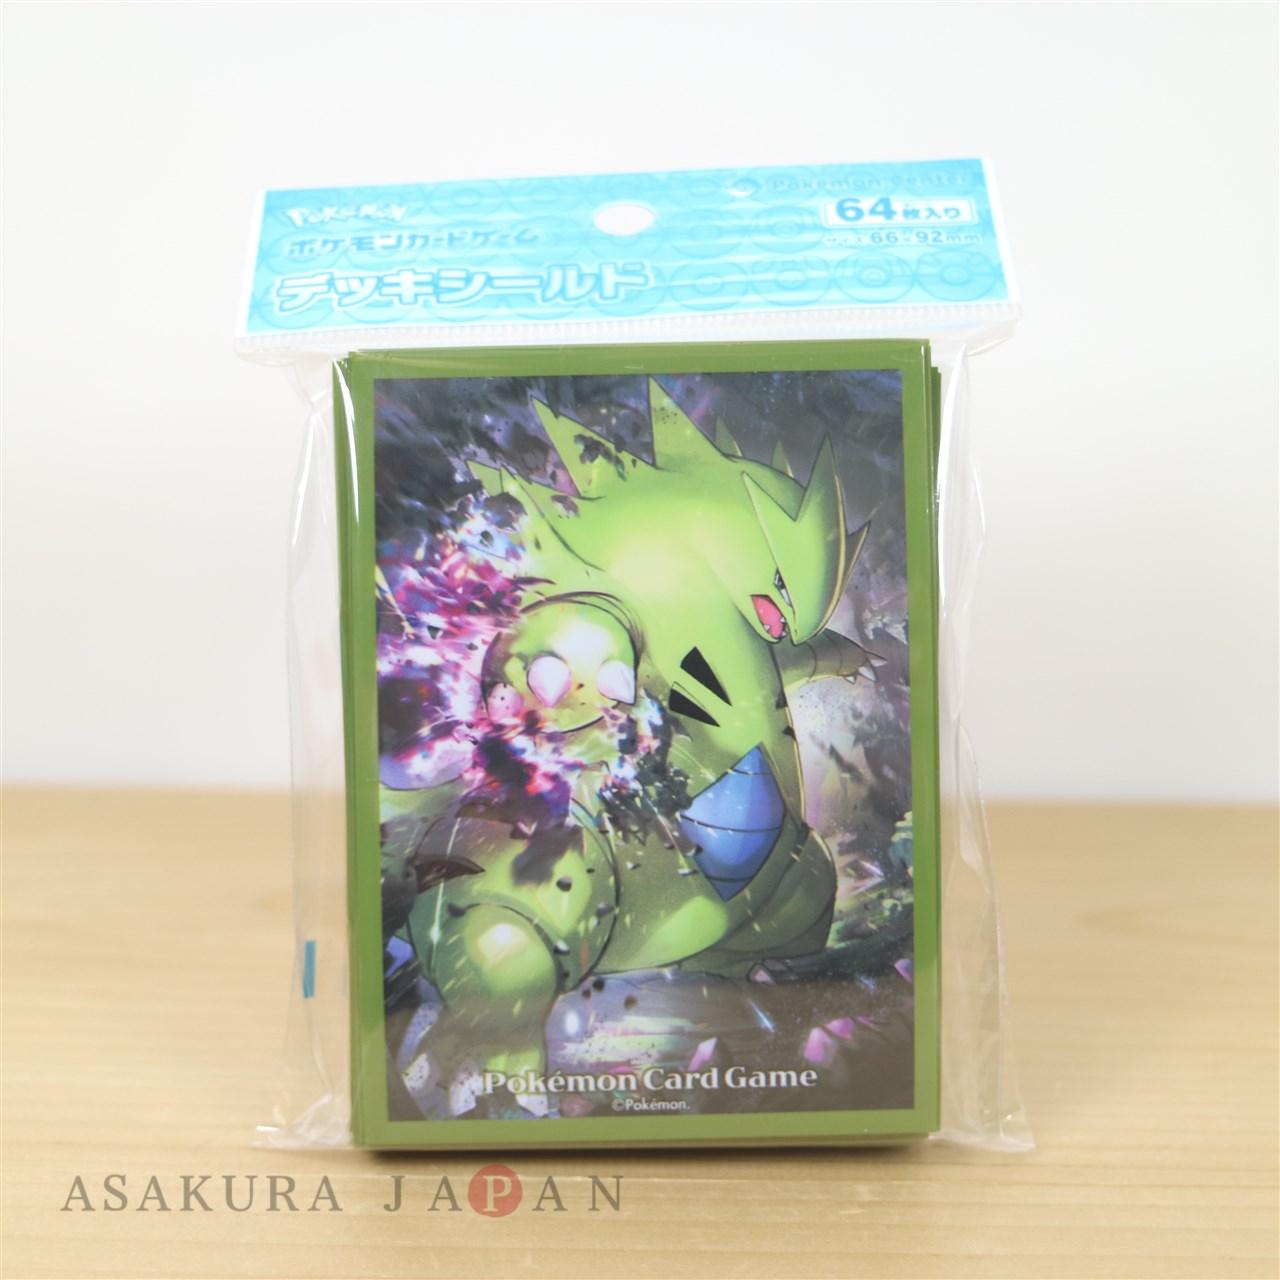 64 Sleeves Pokemon center JAPAN Jumpluff Natu Skiploom Card Deck Shields